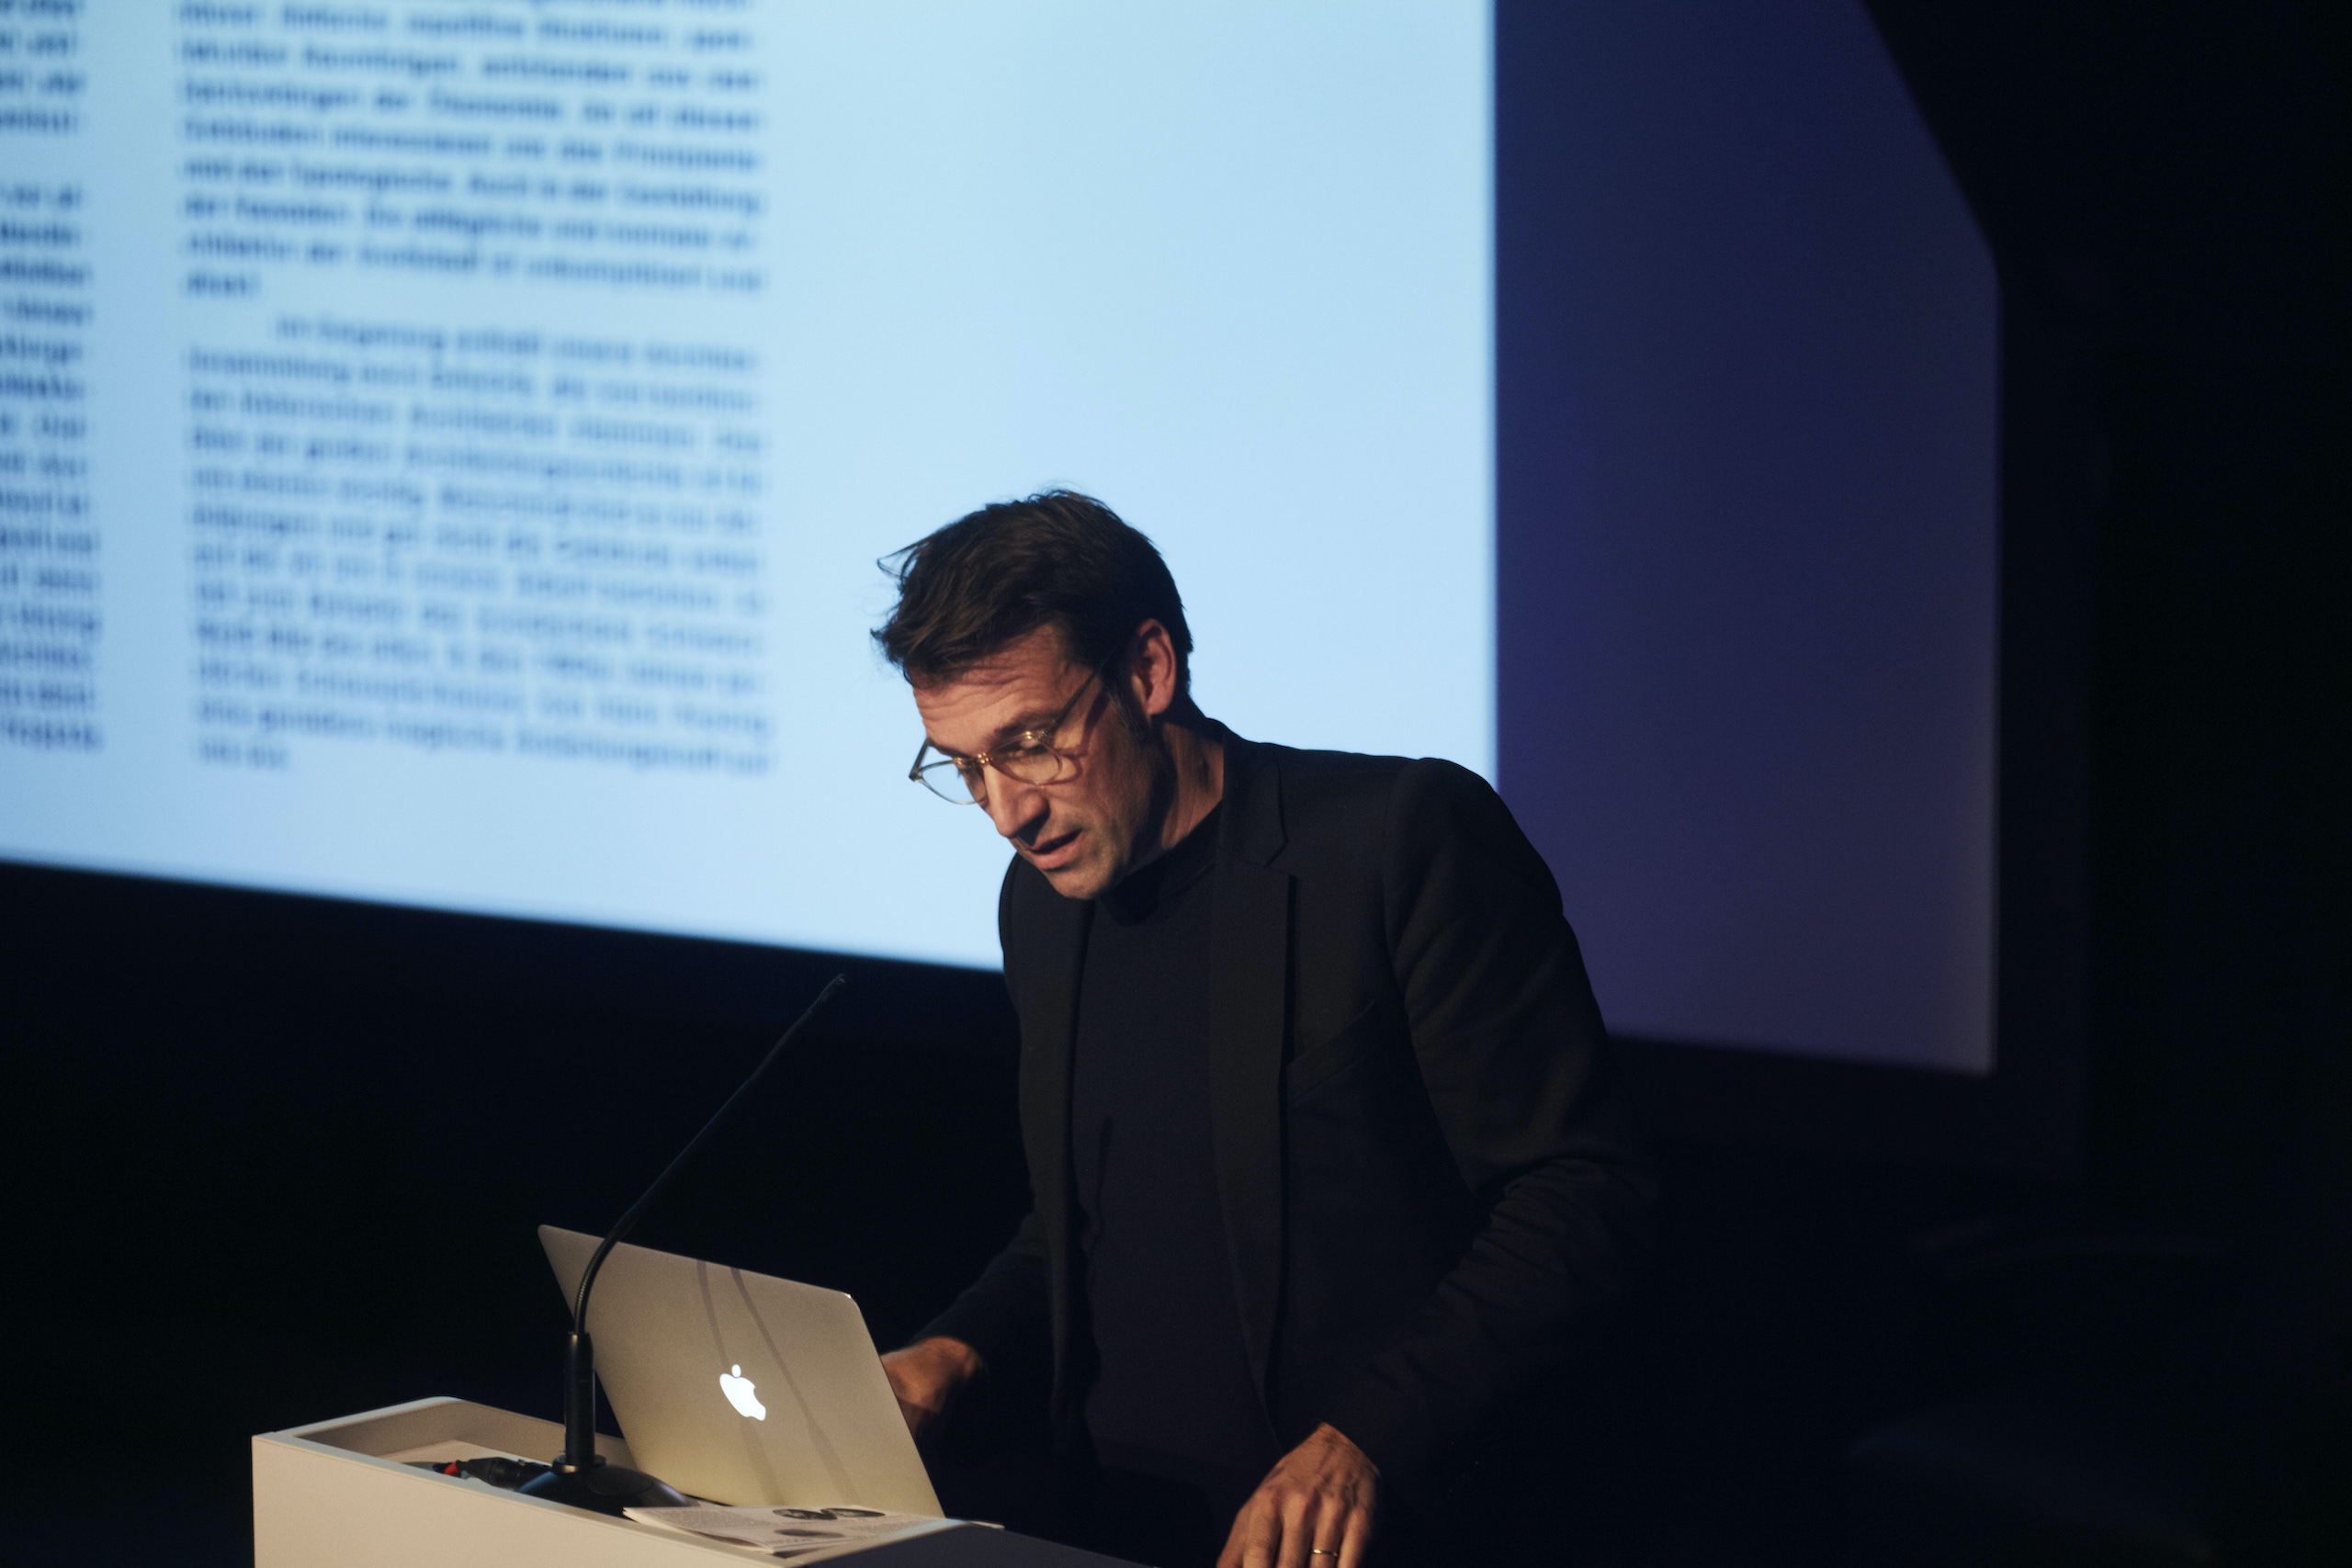 Emanual Christ Architecture Matters Konferenz 2017 Technikum München